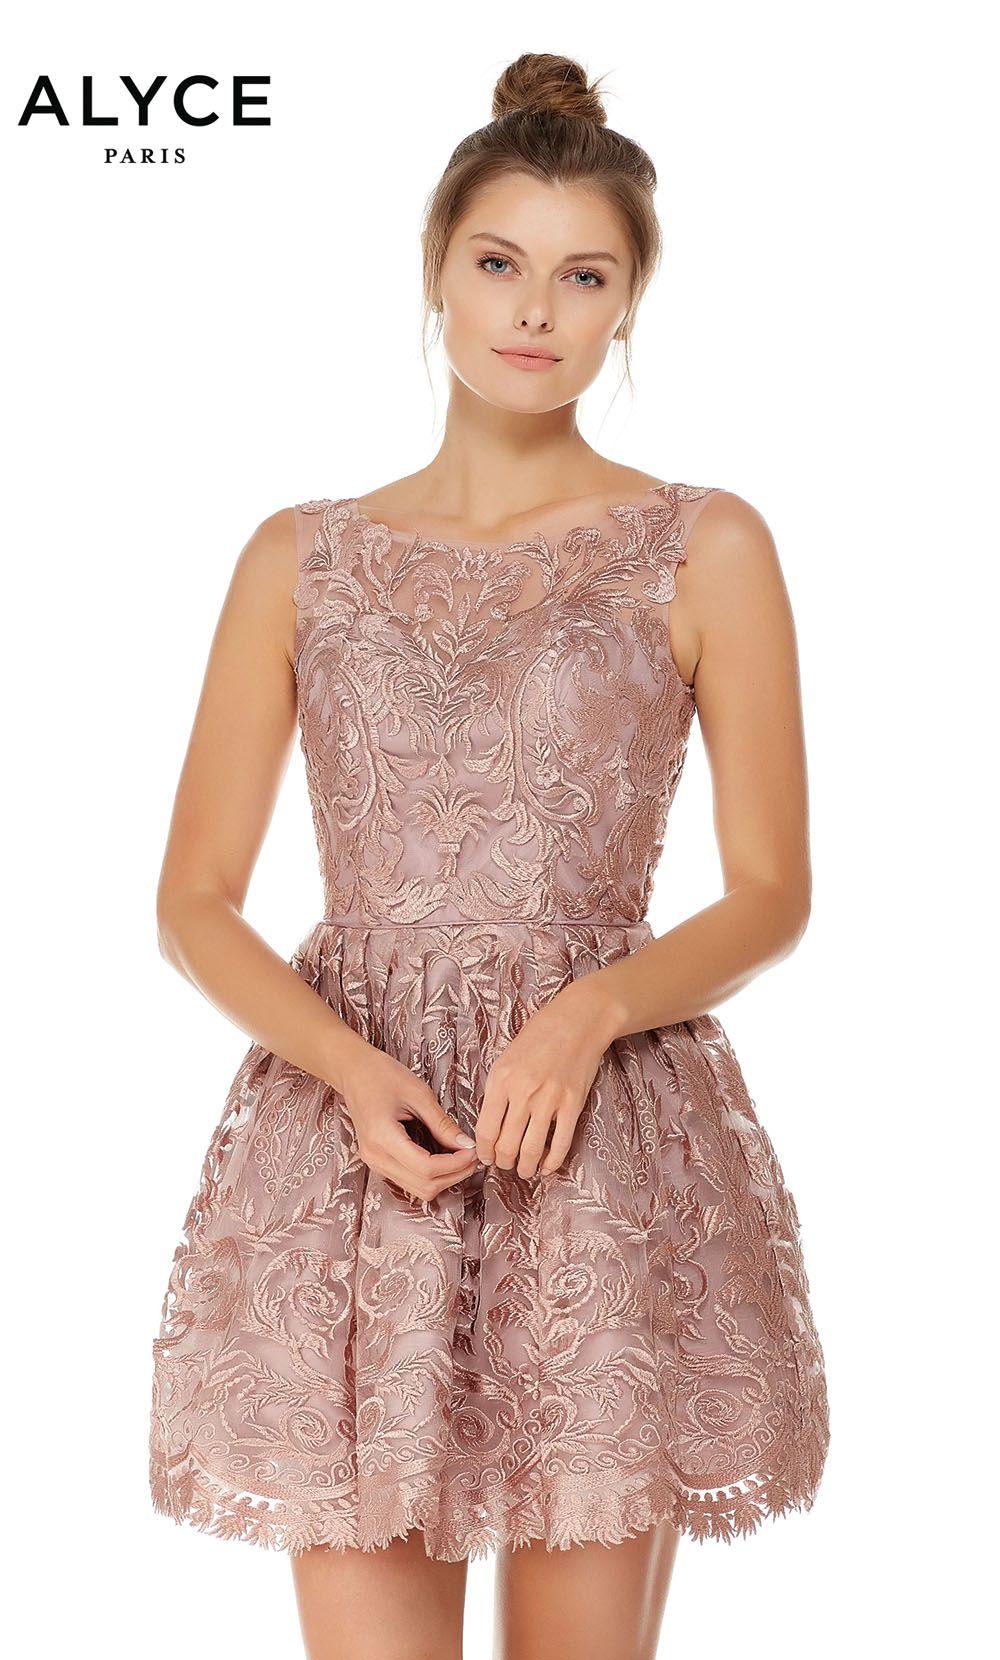 86713af8143 Style 3761  Rosewood Size 4  Alyce  AlyceParis  BridesBouquet  Homecoming   Homecoming18  Homecoming2018  HoCo  HoCo18  HoCo2018  Formal  FormalDress  ...